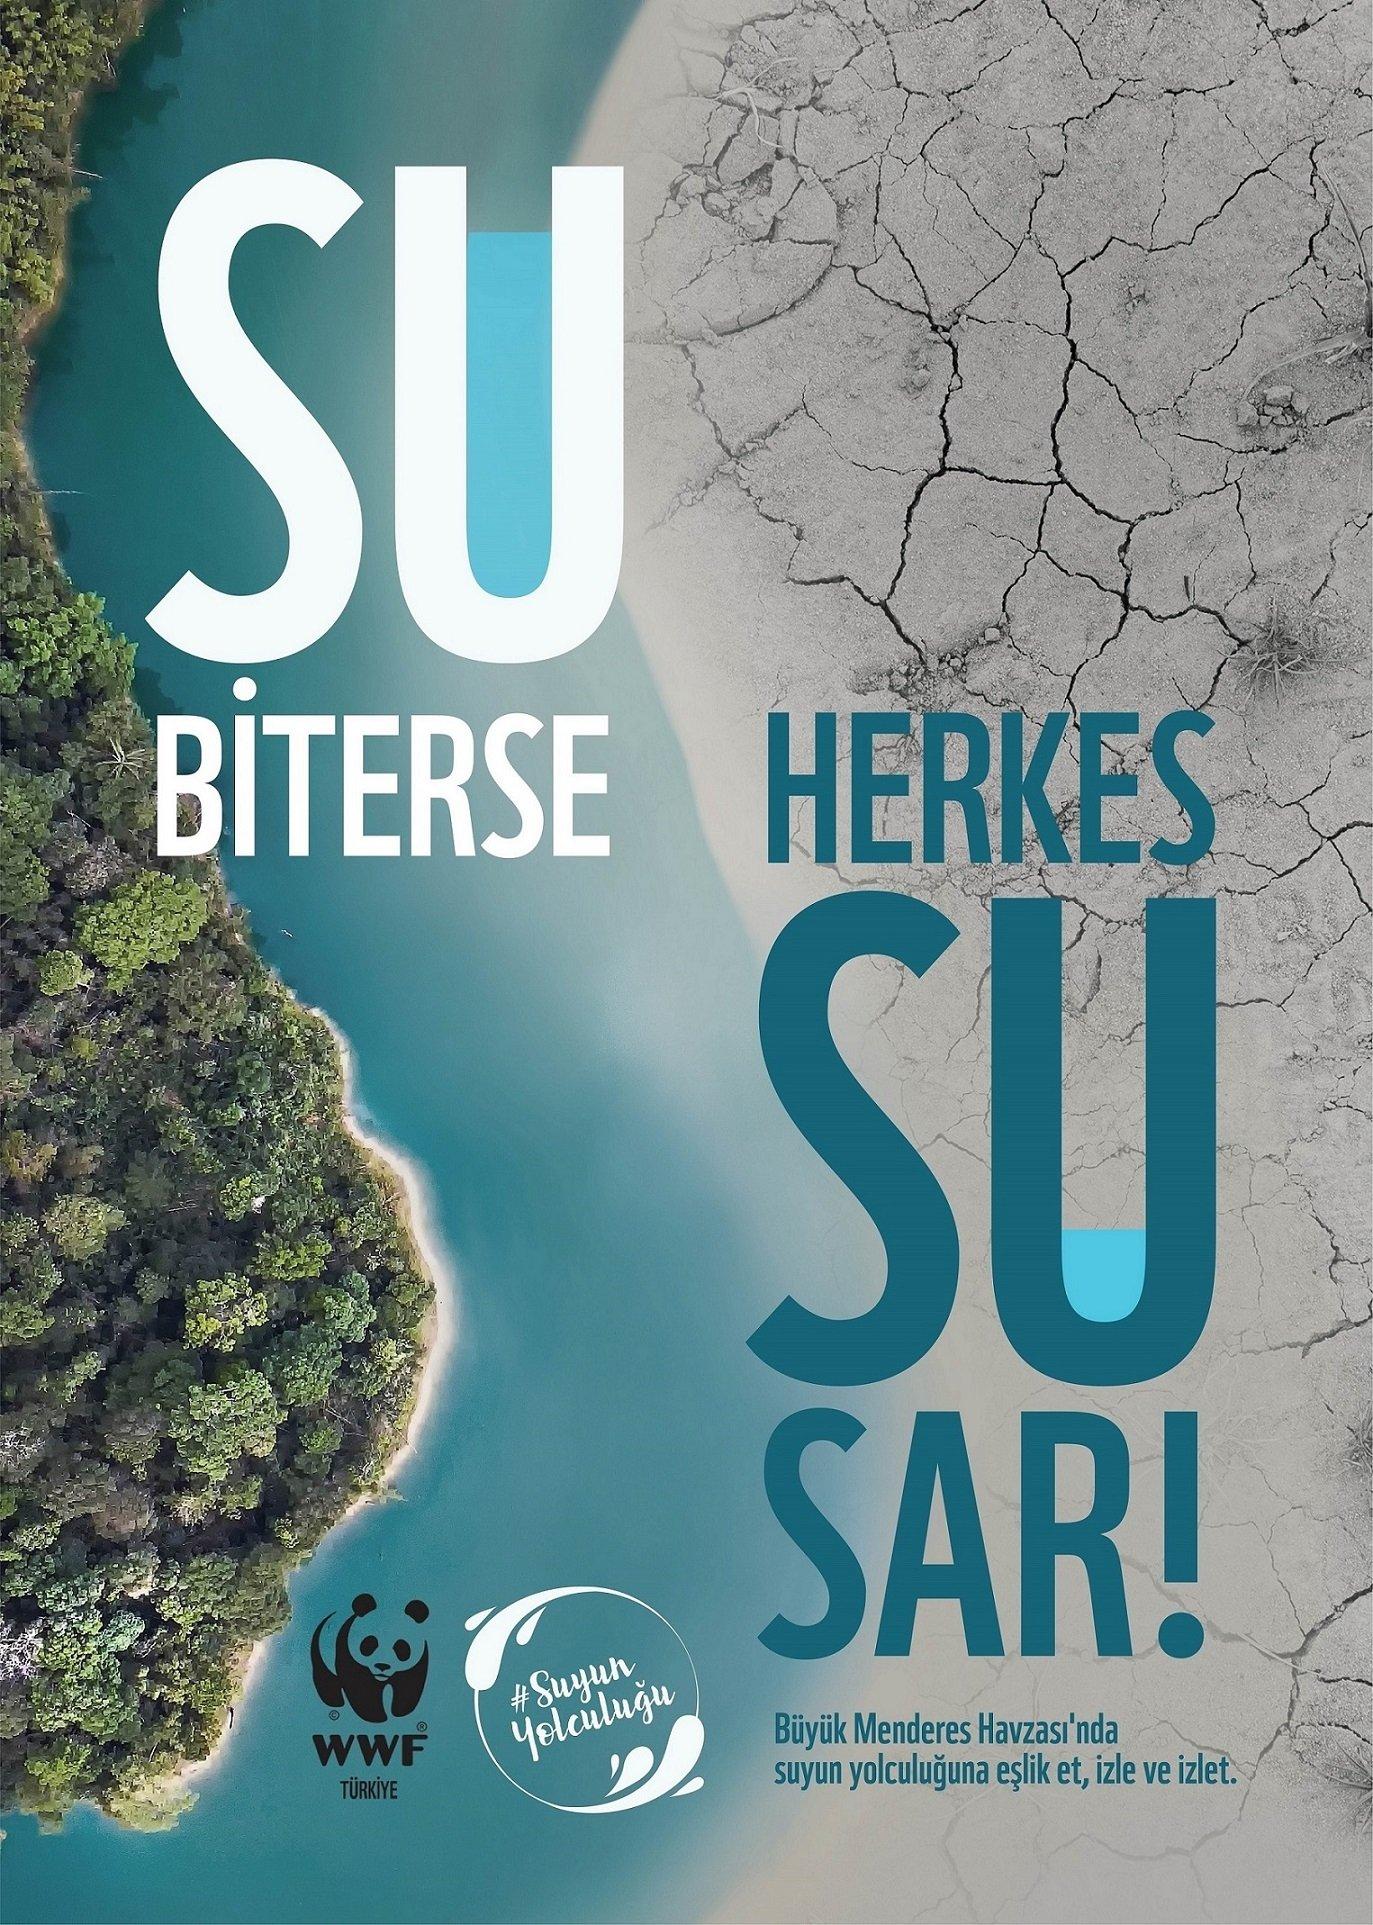 WWF Turkey's water scarcity awareness campaign.